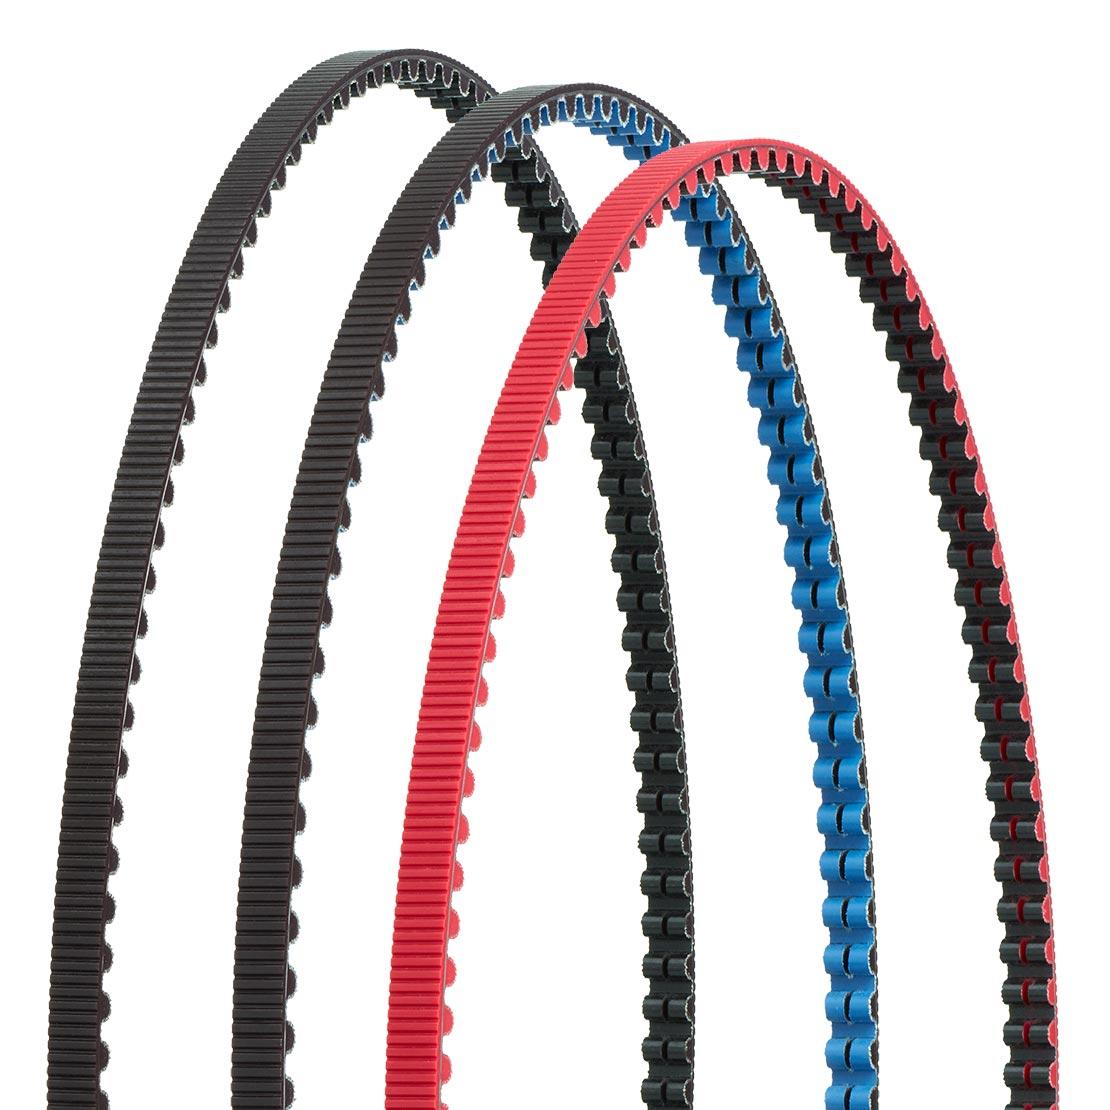 blue-black-red-cdx-collage-centertrack-gates-carbon-drive.jpg